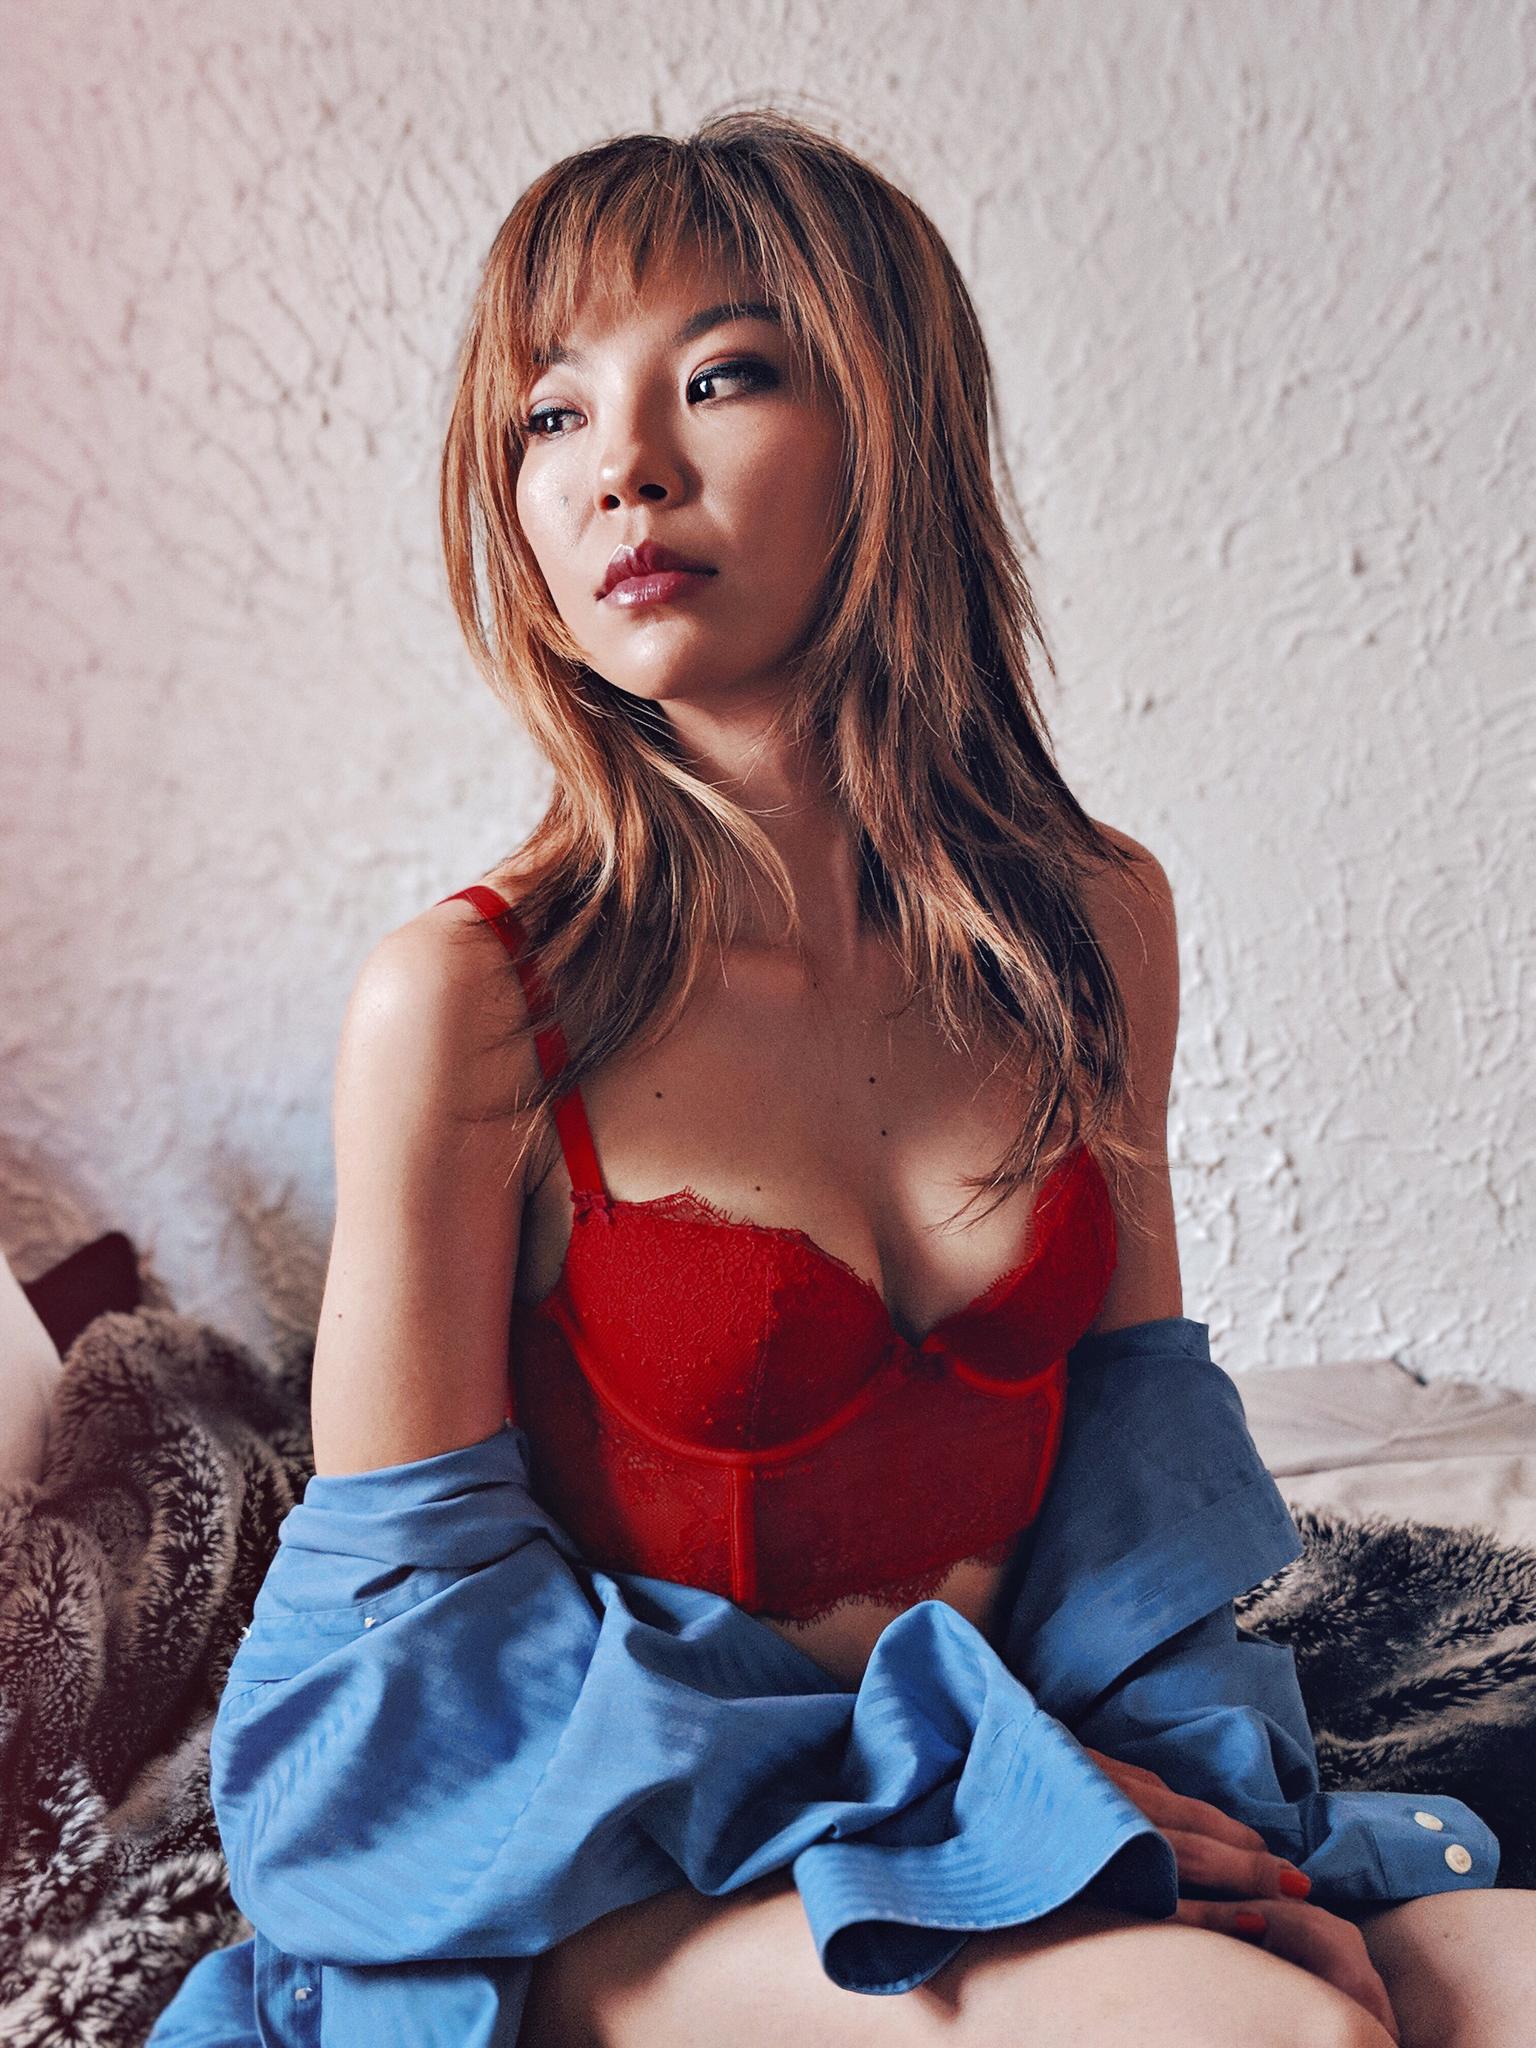 Model Boudoir Portrait